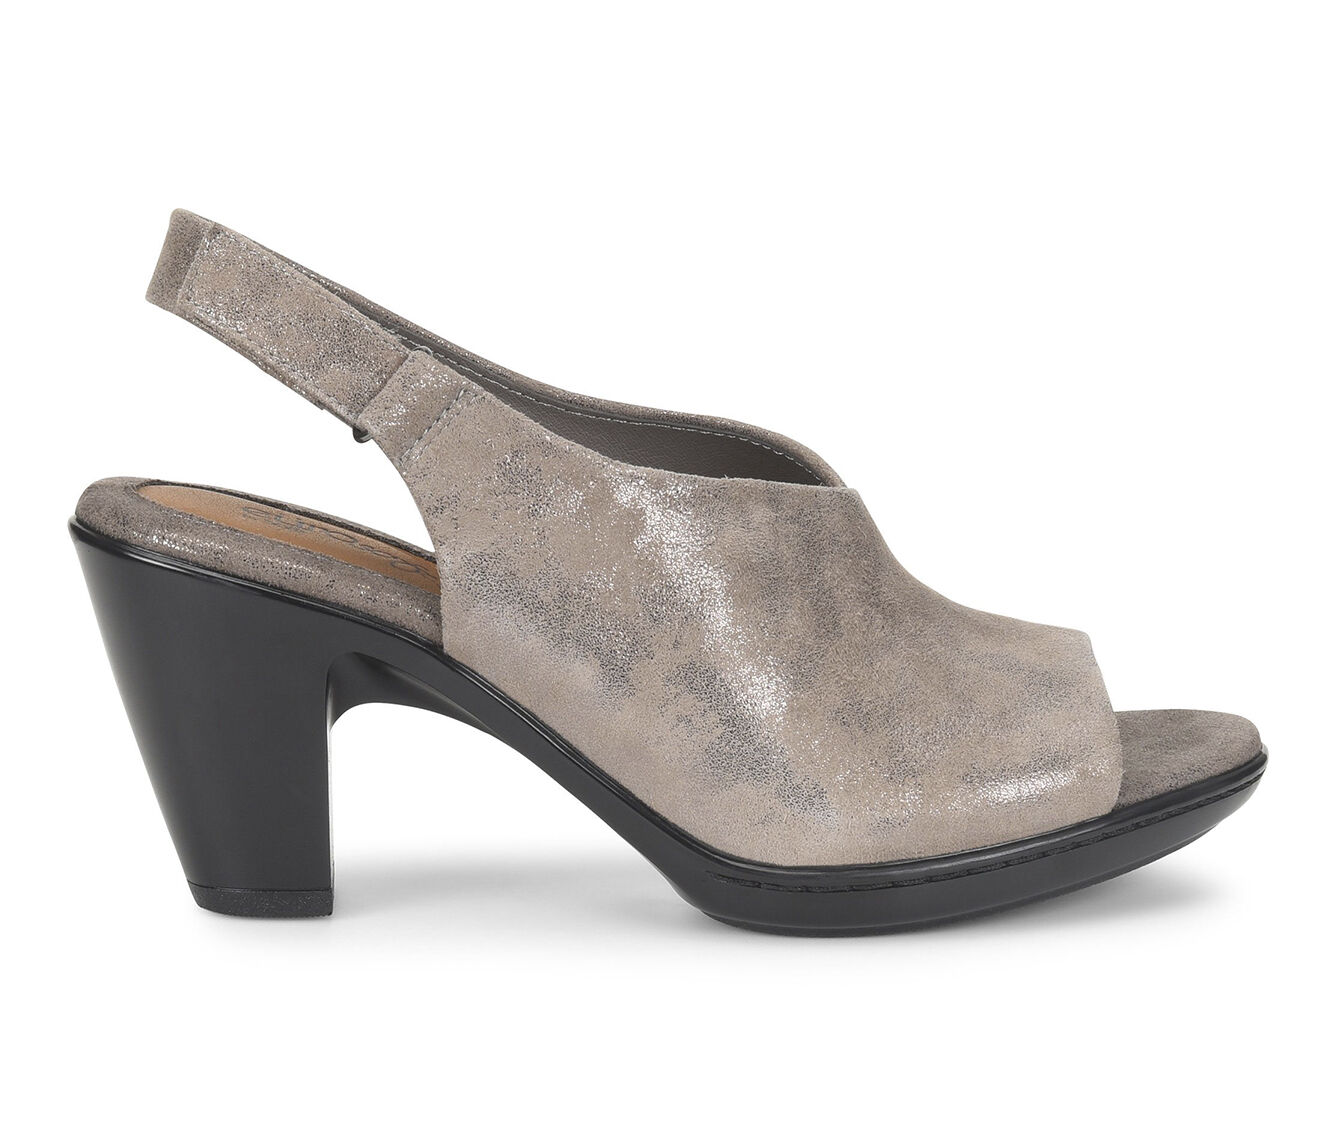 buy authentic new arrivals Women's EuroSoft Valona Dress Sandals Smoke